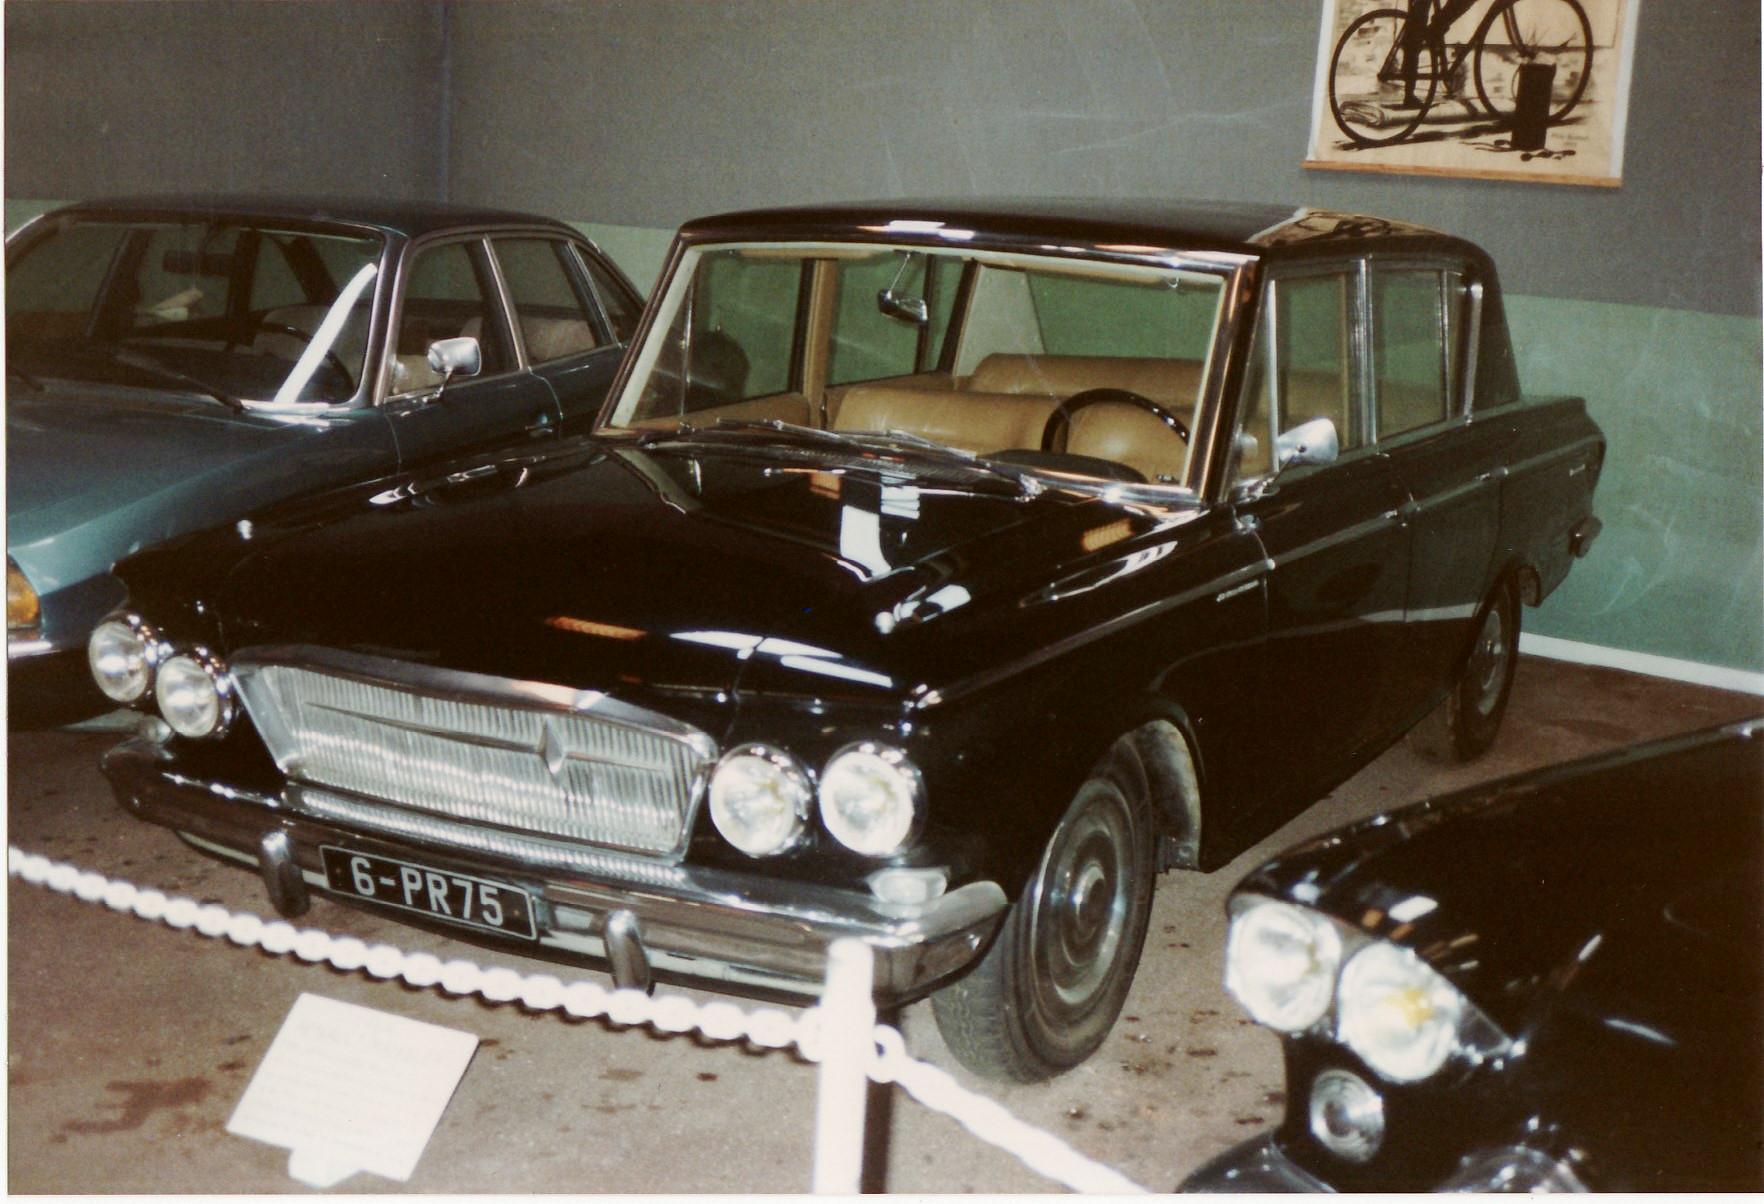 File:Rambler Renault Presidential 1962 (16284294938).jpg - Wikimedia ...